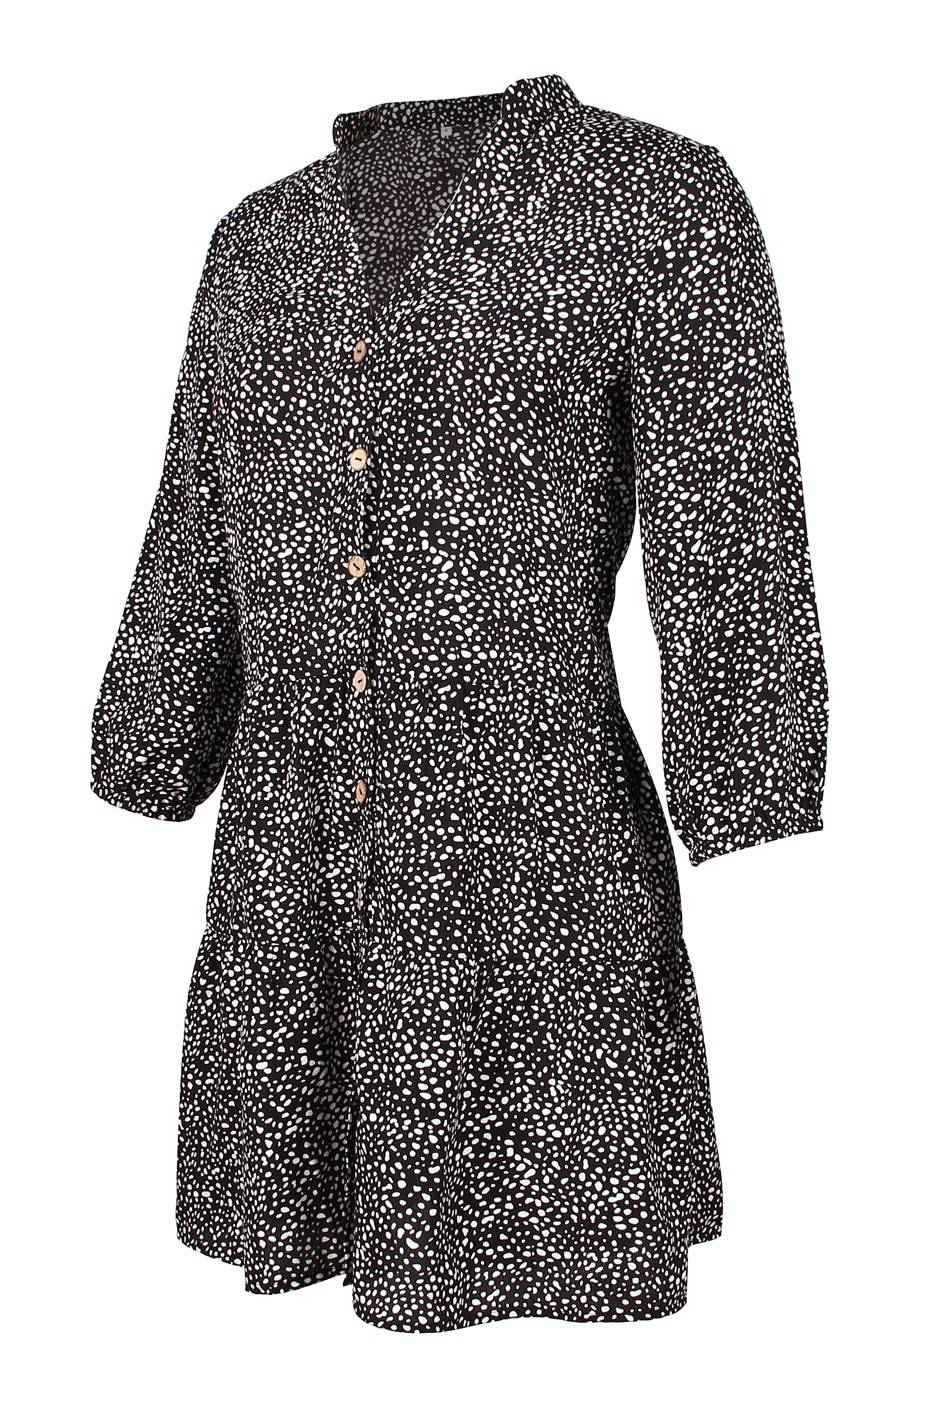 Single breasted print v-neck three quarter sleeve mini dress